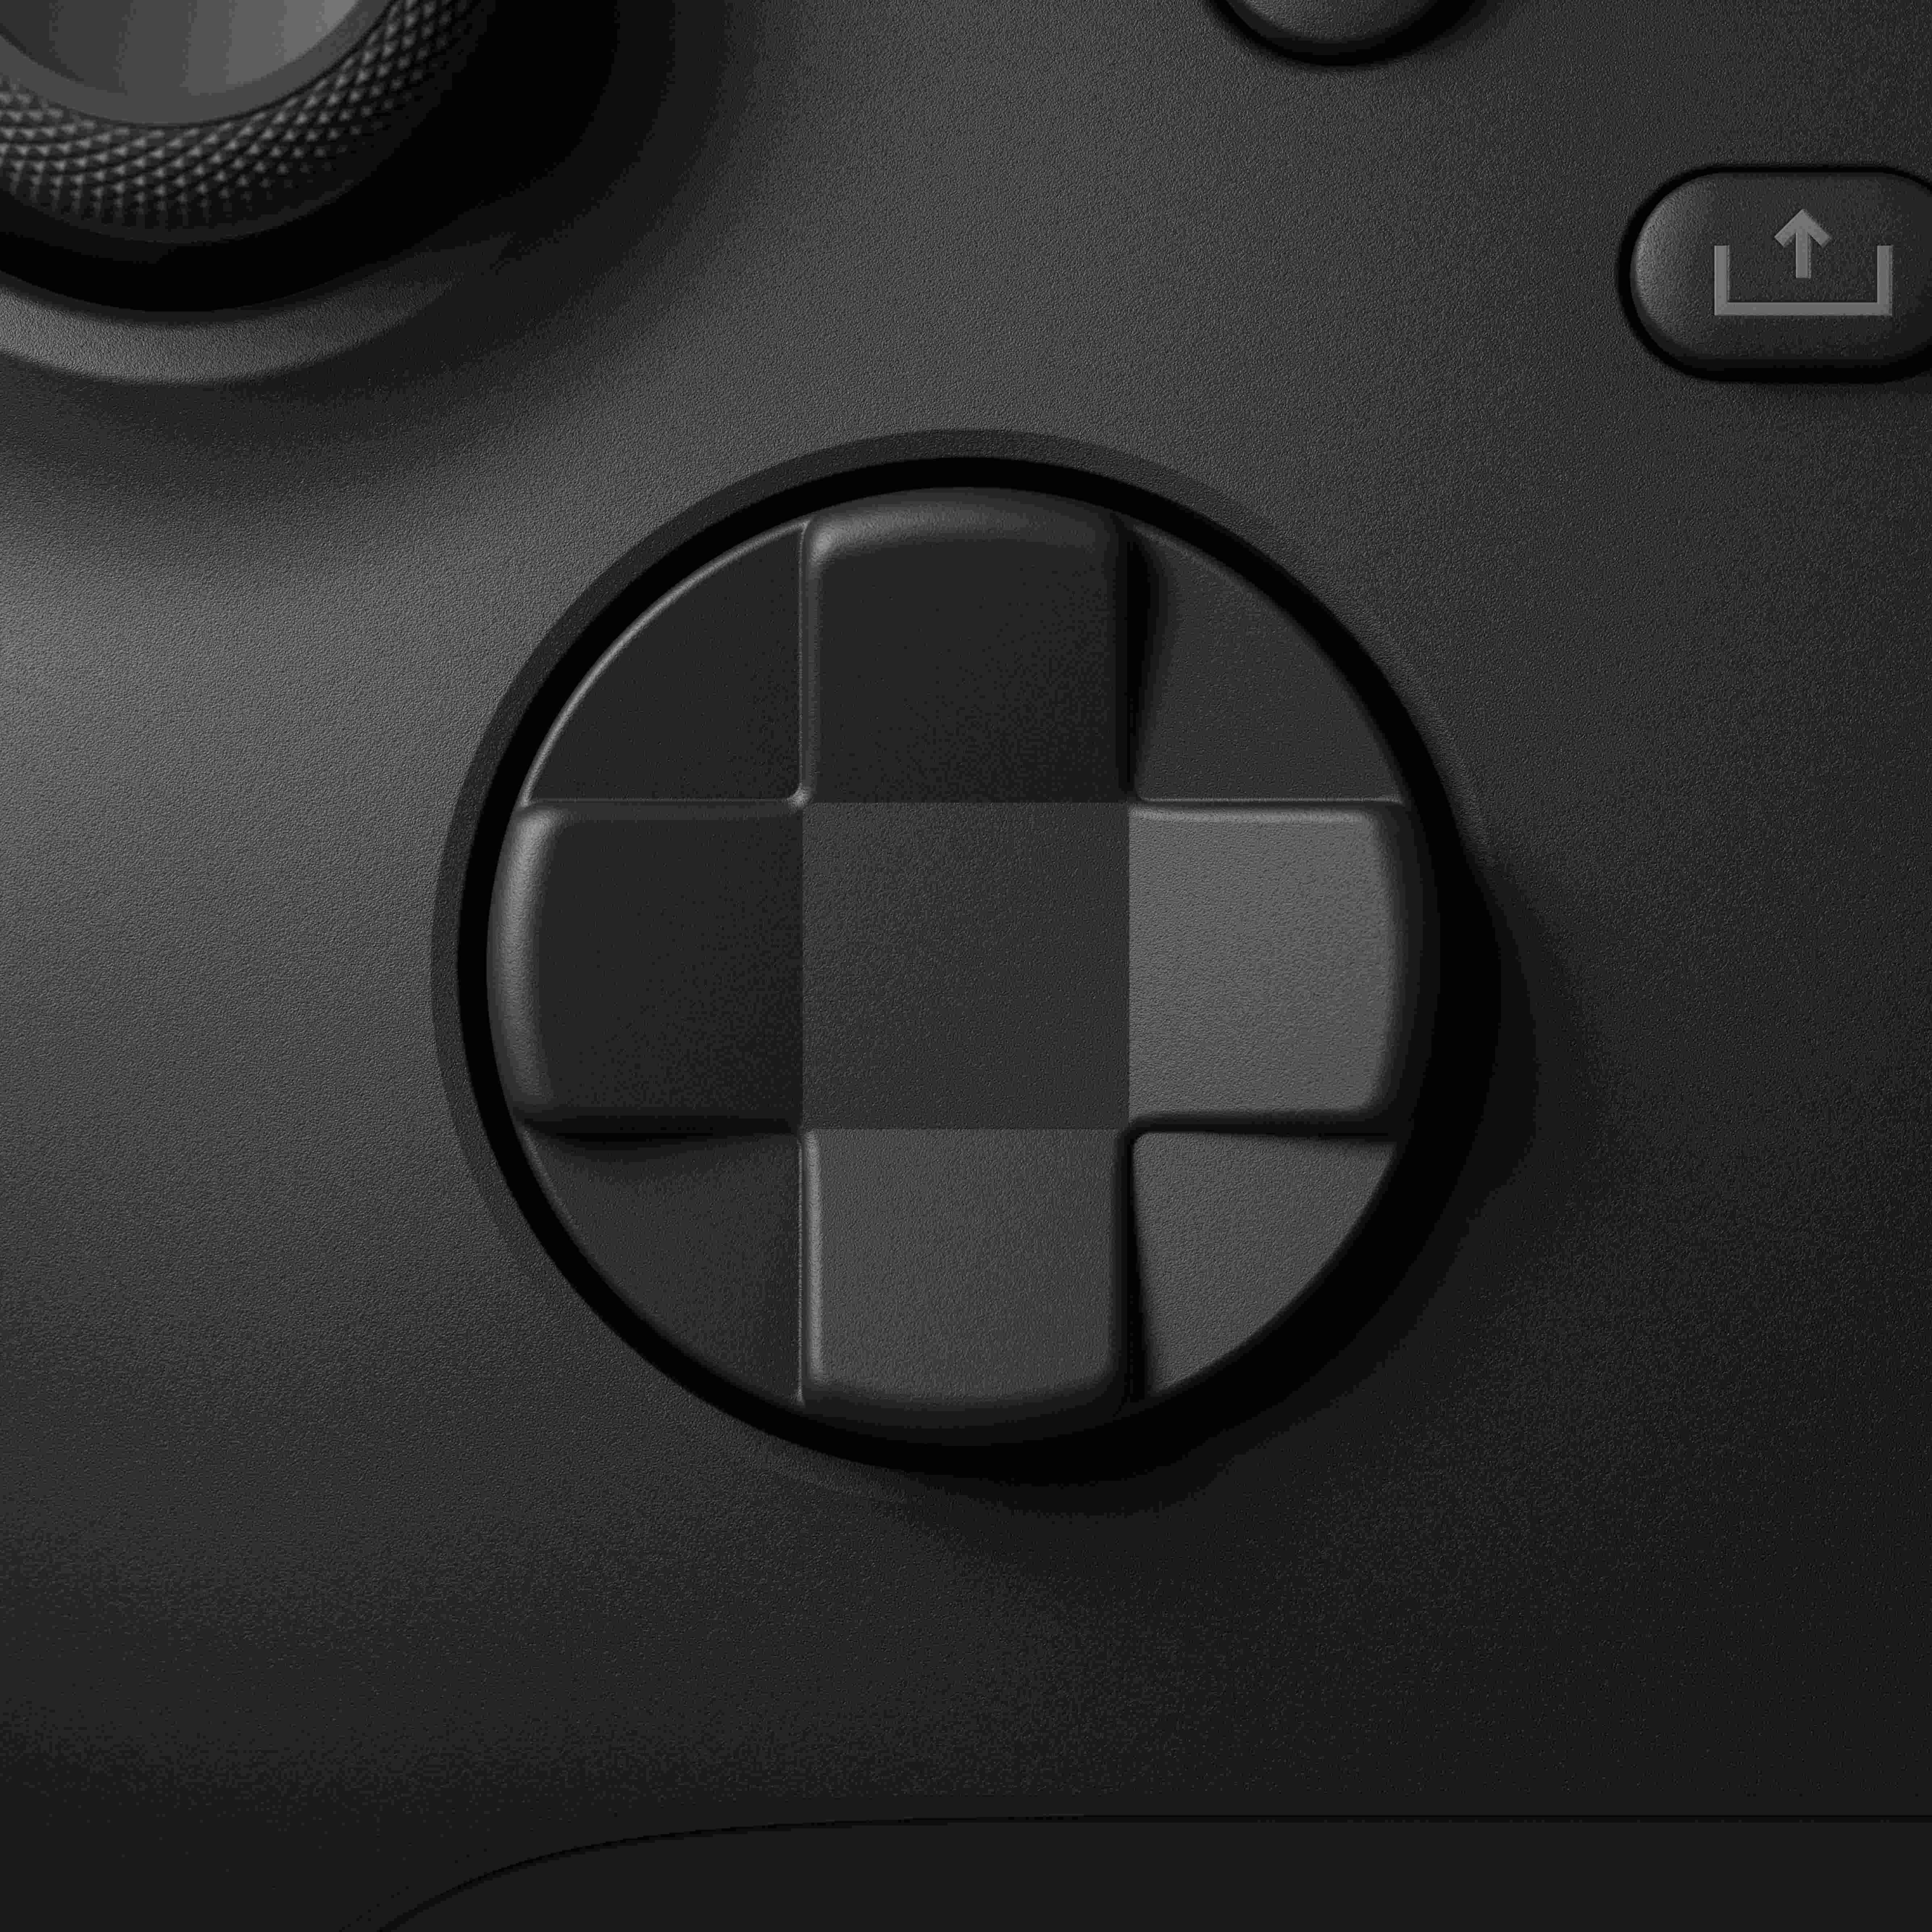 Xbox Series X Controller – Bild 2